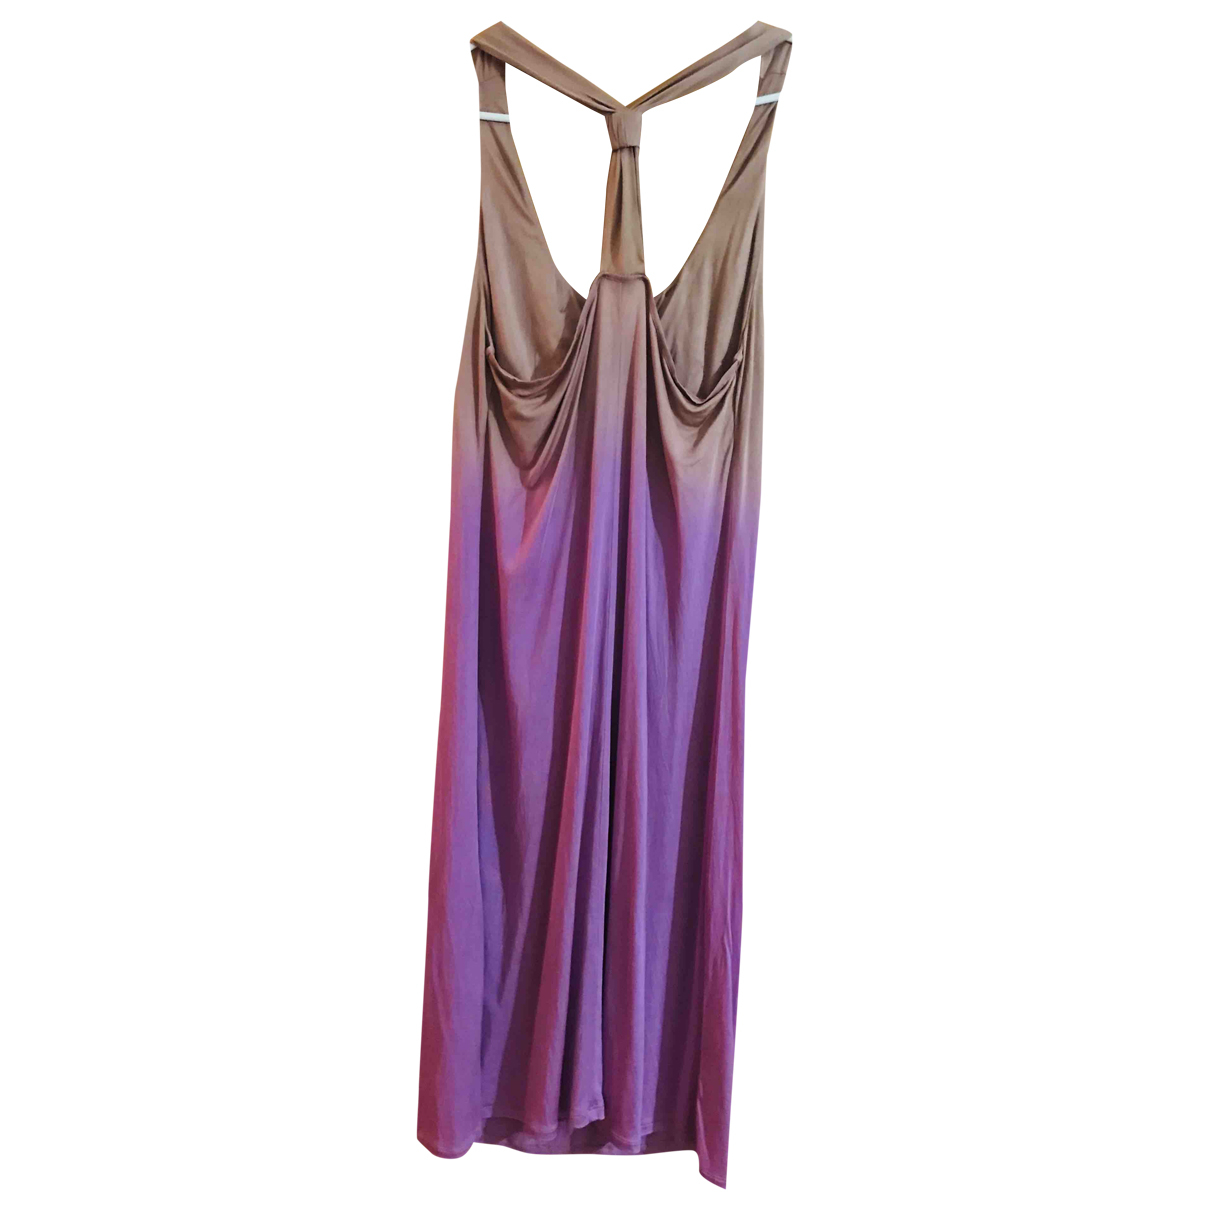 Max & Co \N Multicolour dress for Women 44 IT